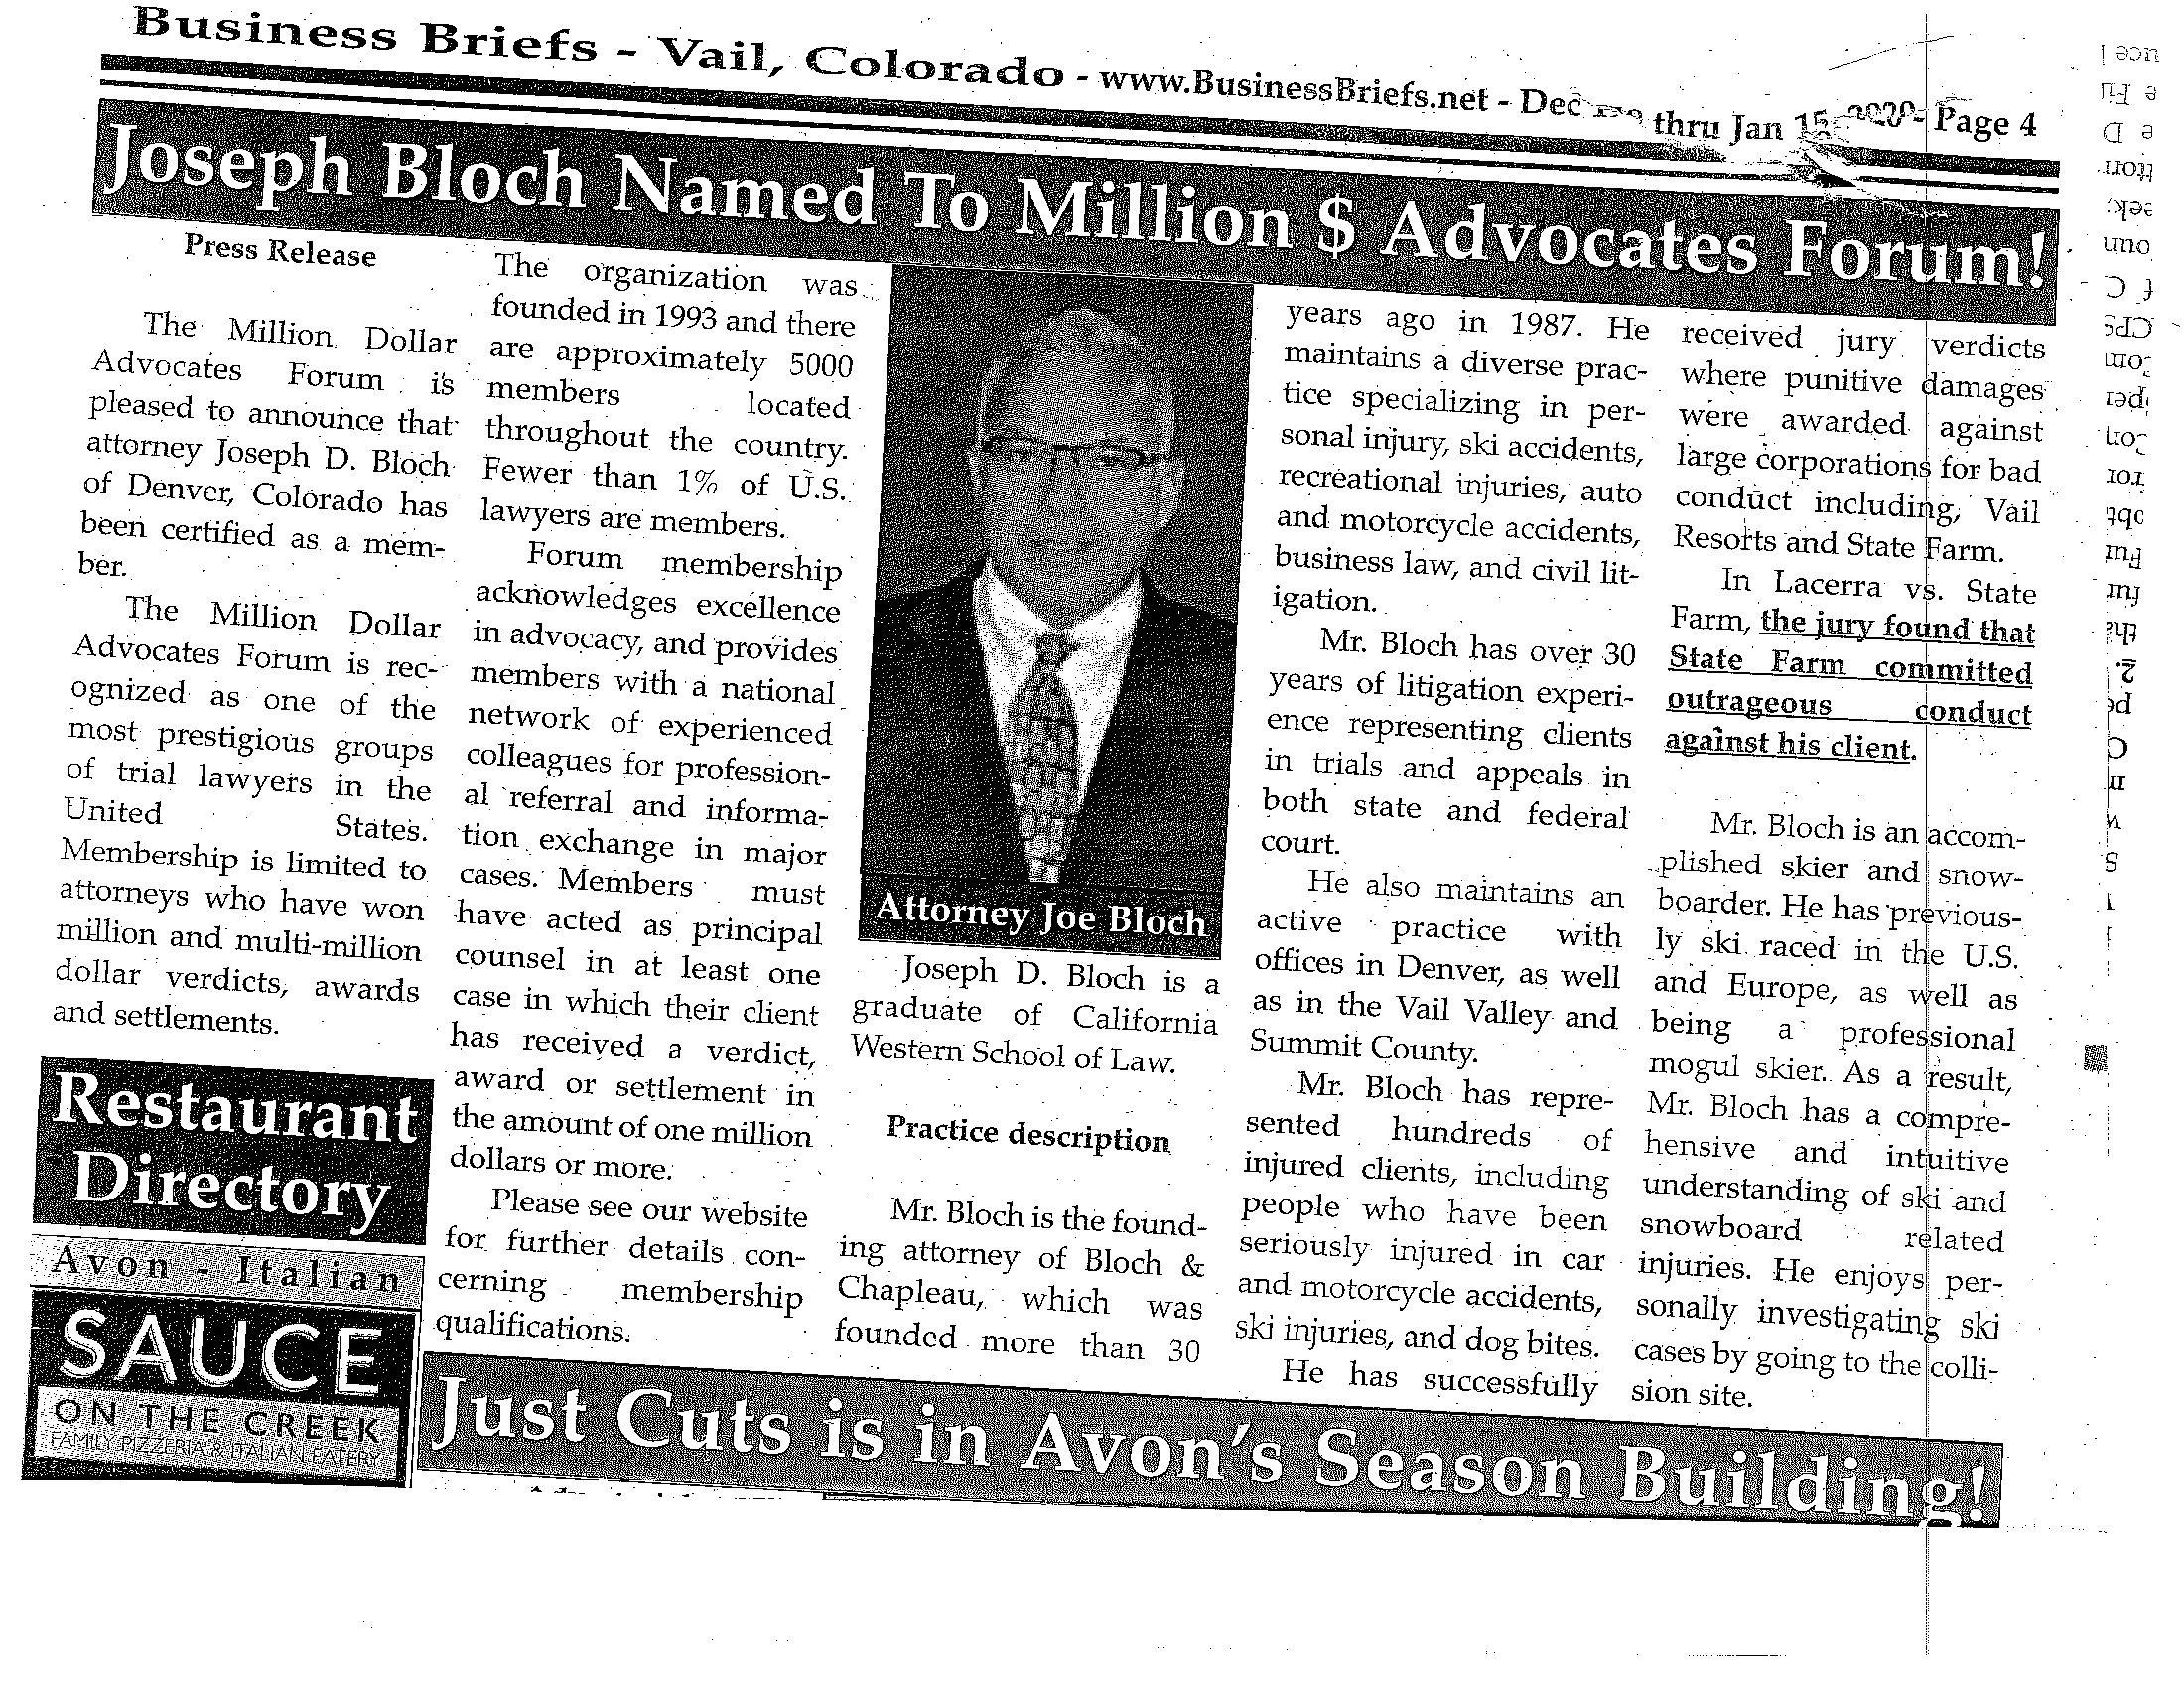 Joseph D. Bloch Named To Million Dollar Advocates Forum.